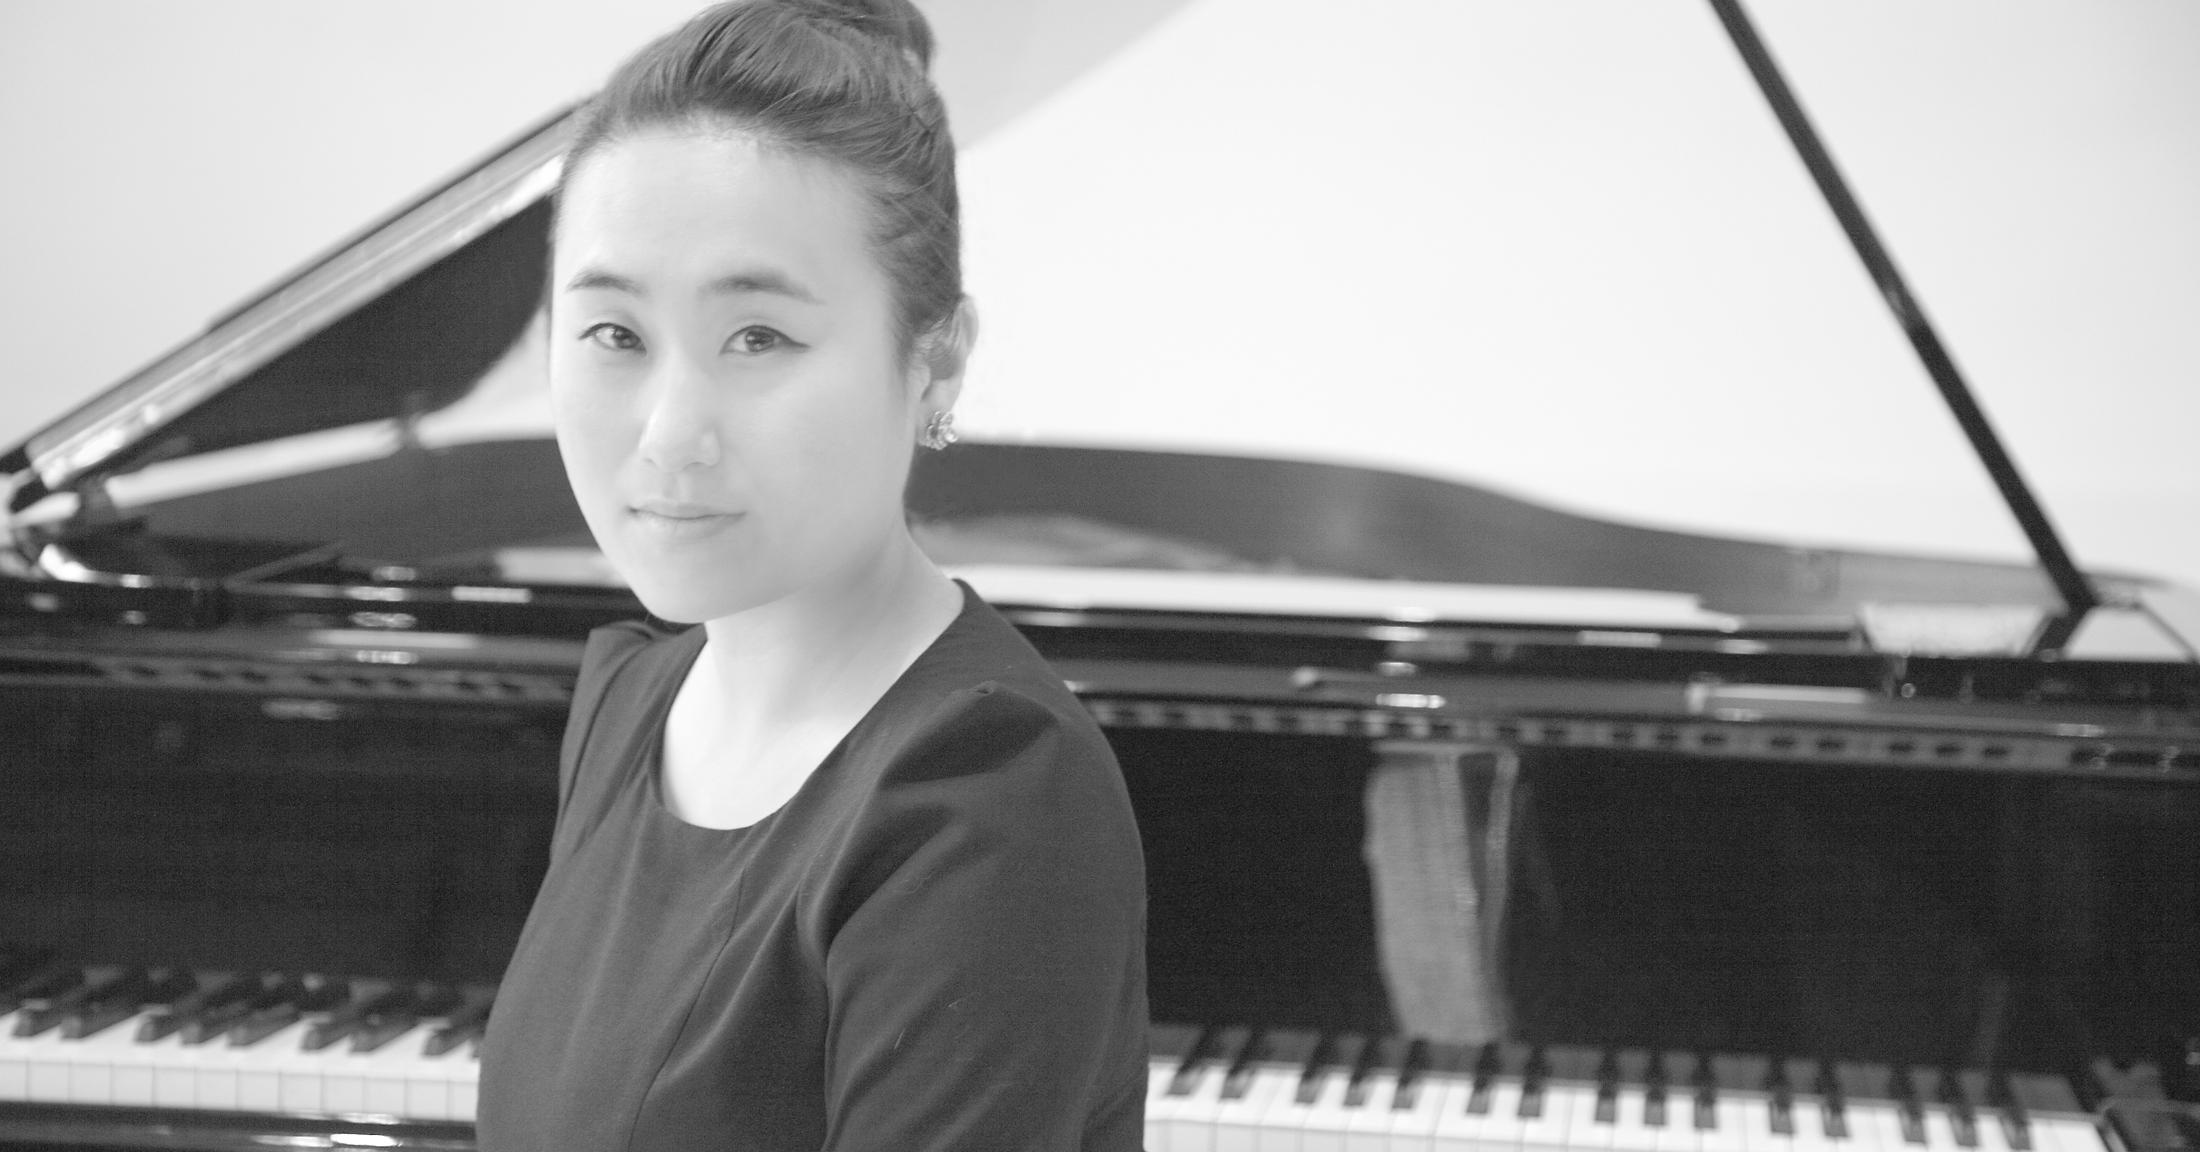 Yoonah_headshop_3_BW.jpg